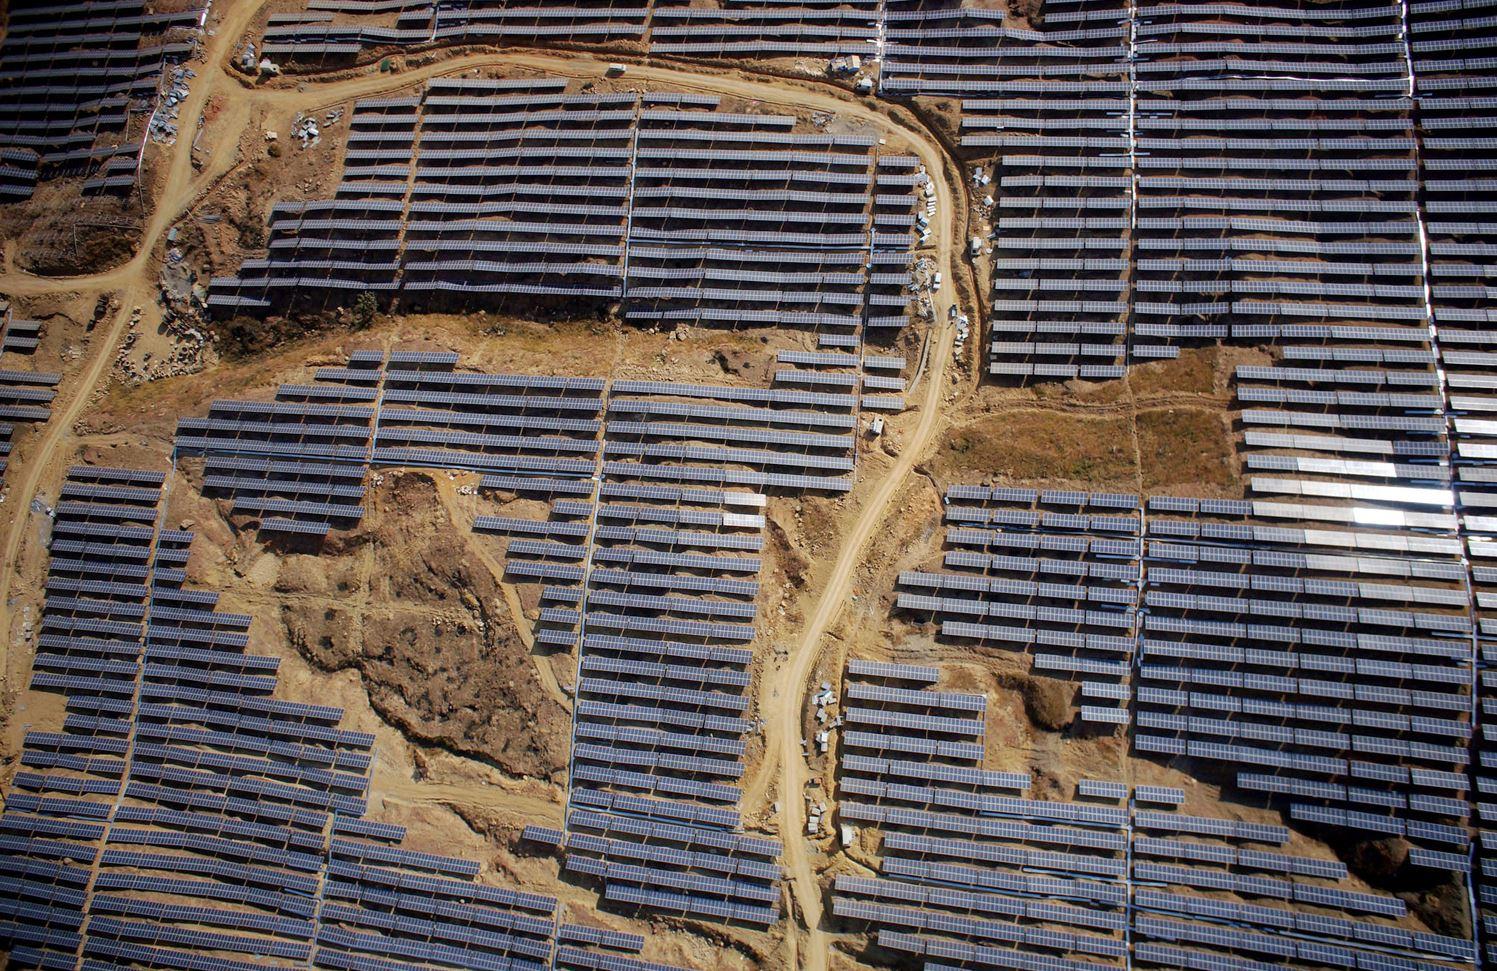 Солнечные батареи на горе Ваньцзяшань в пр. Сычуань.